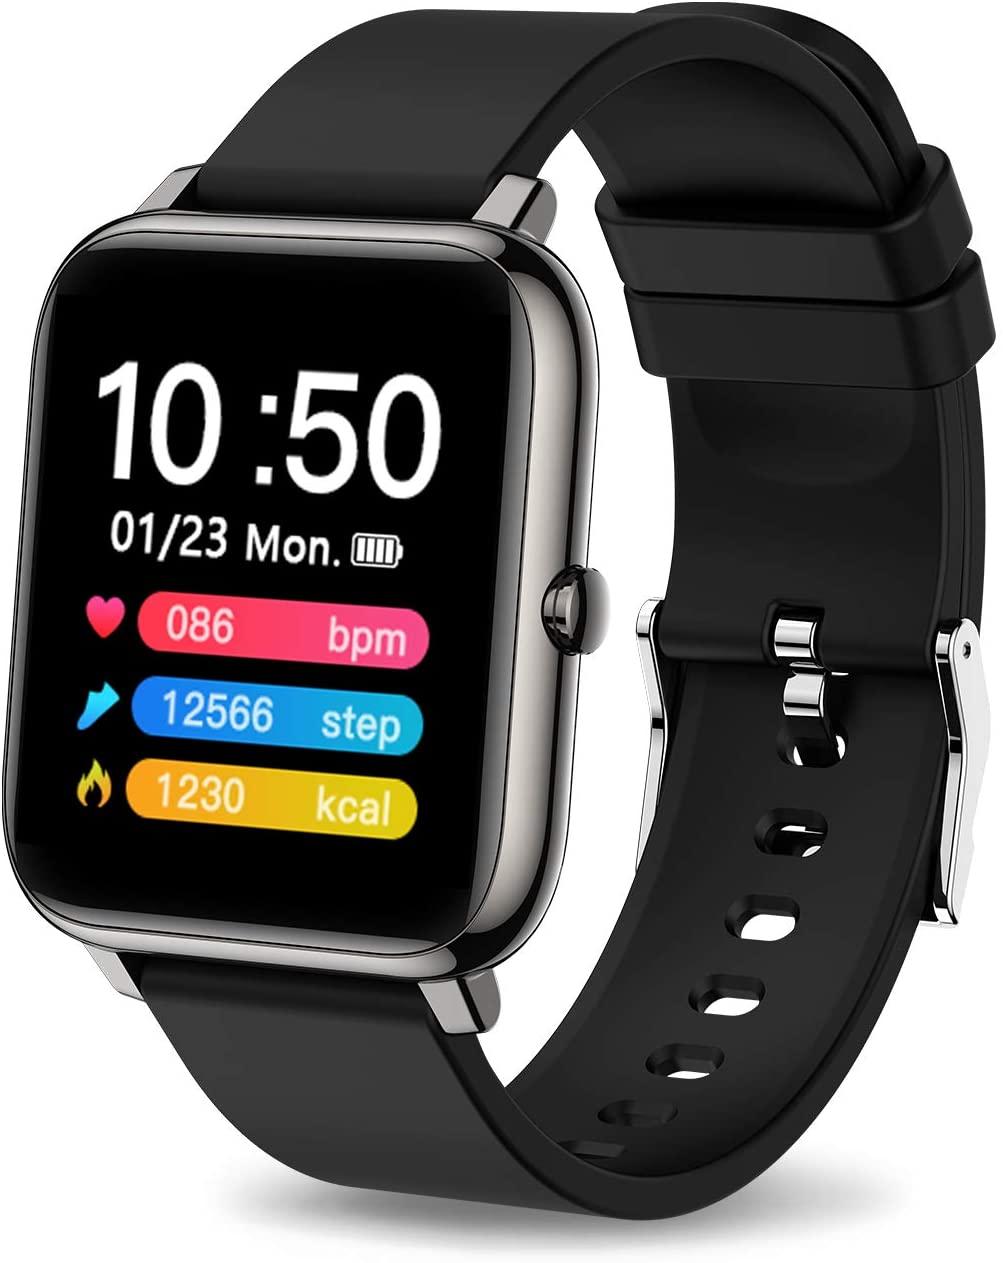 smartwatch-iporachx-pulsera-de-actividad-ip67.jpg